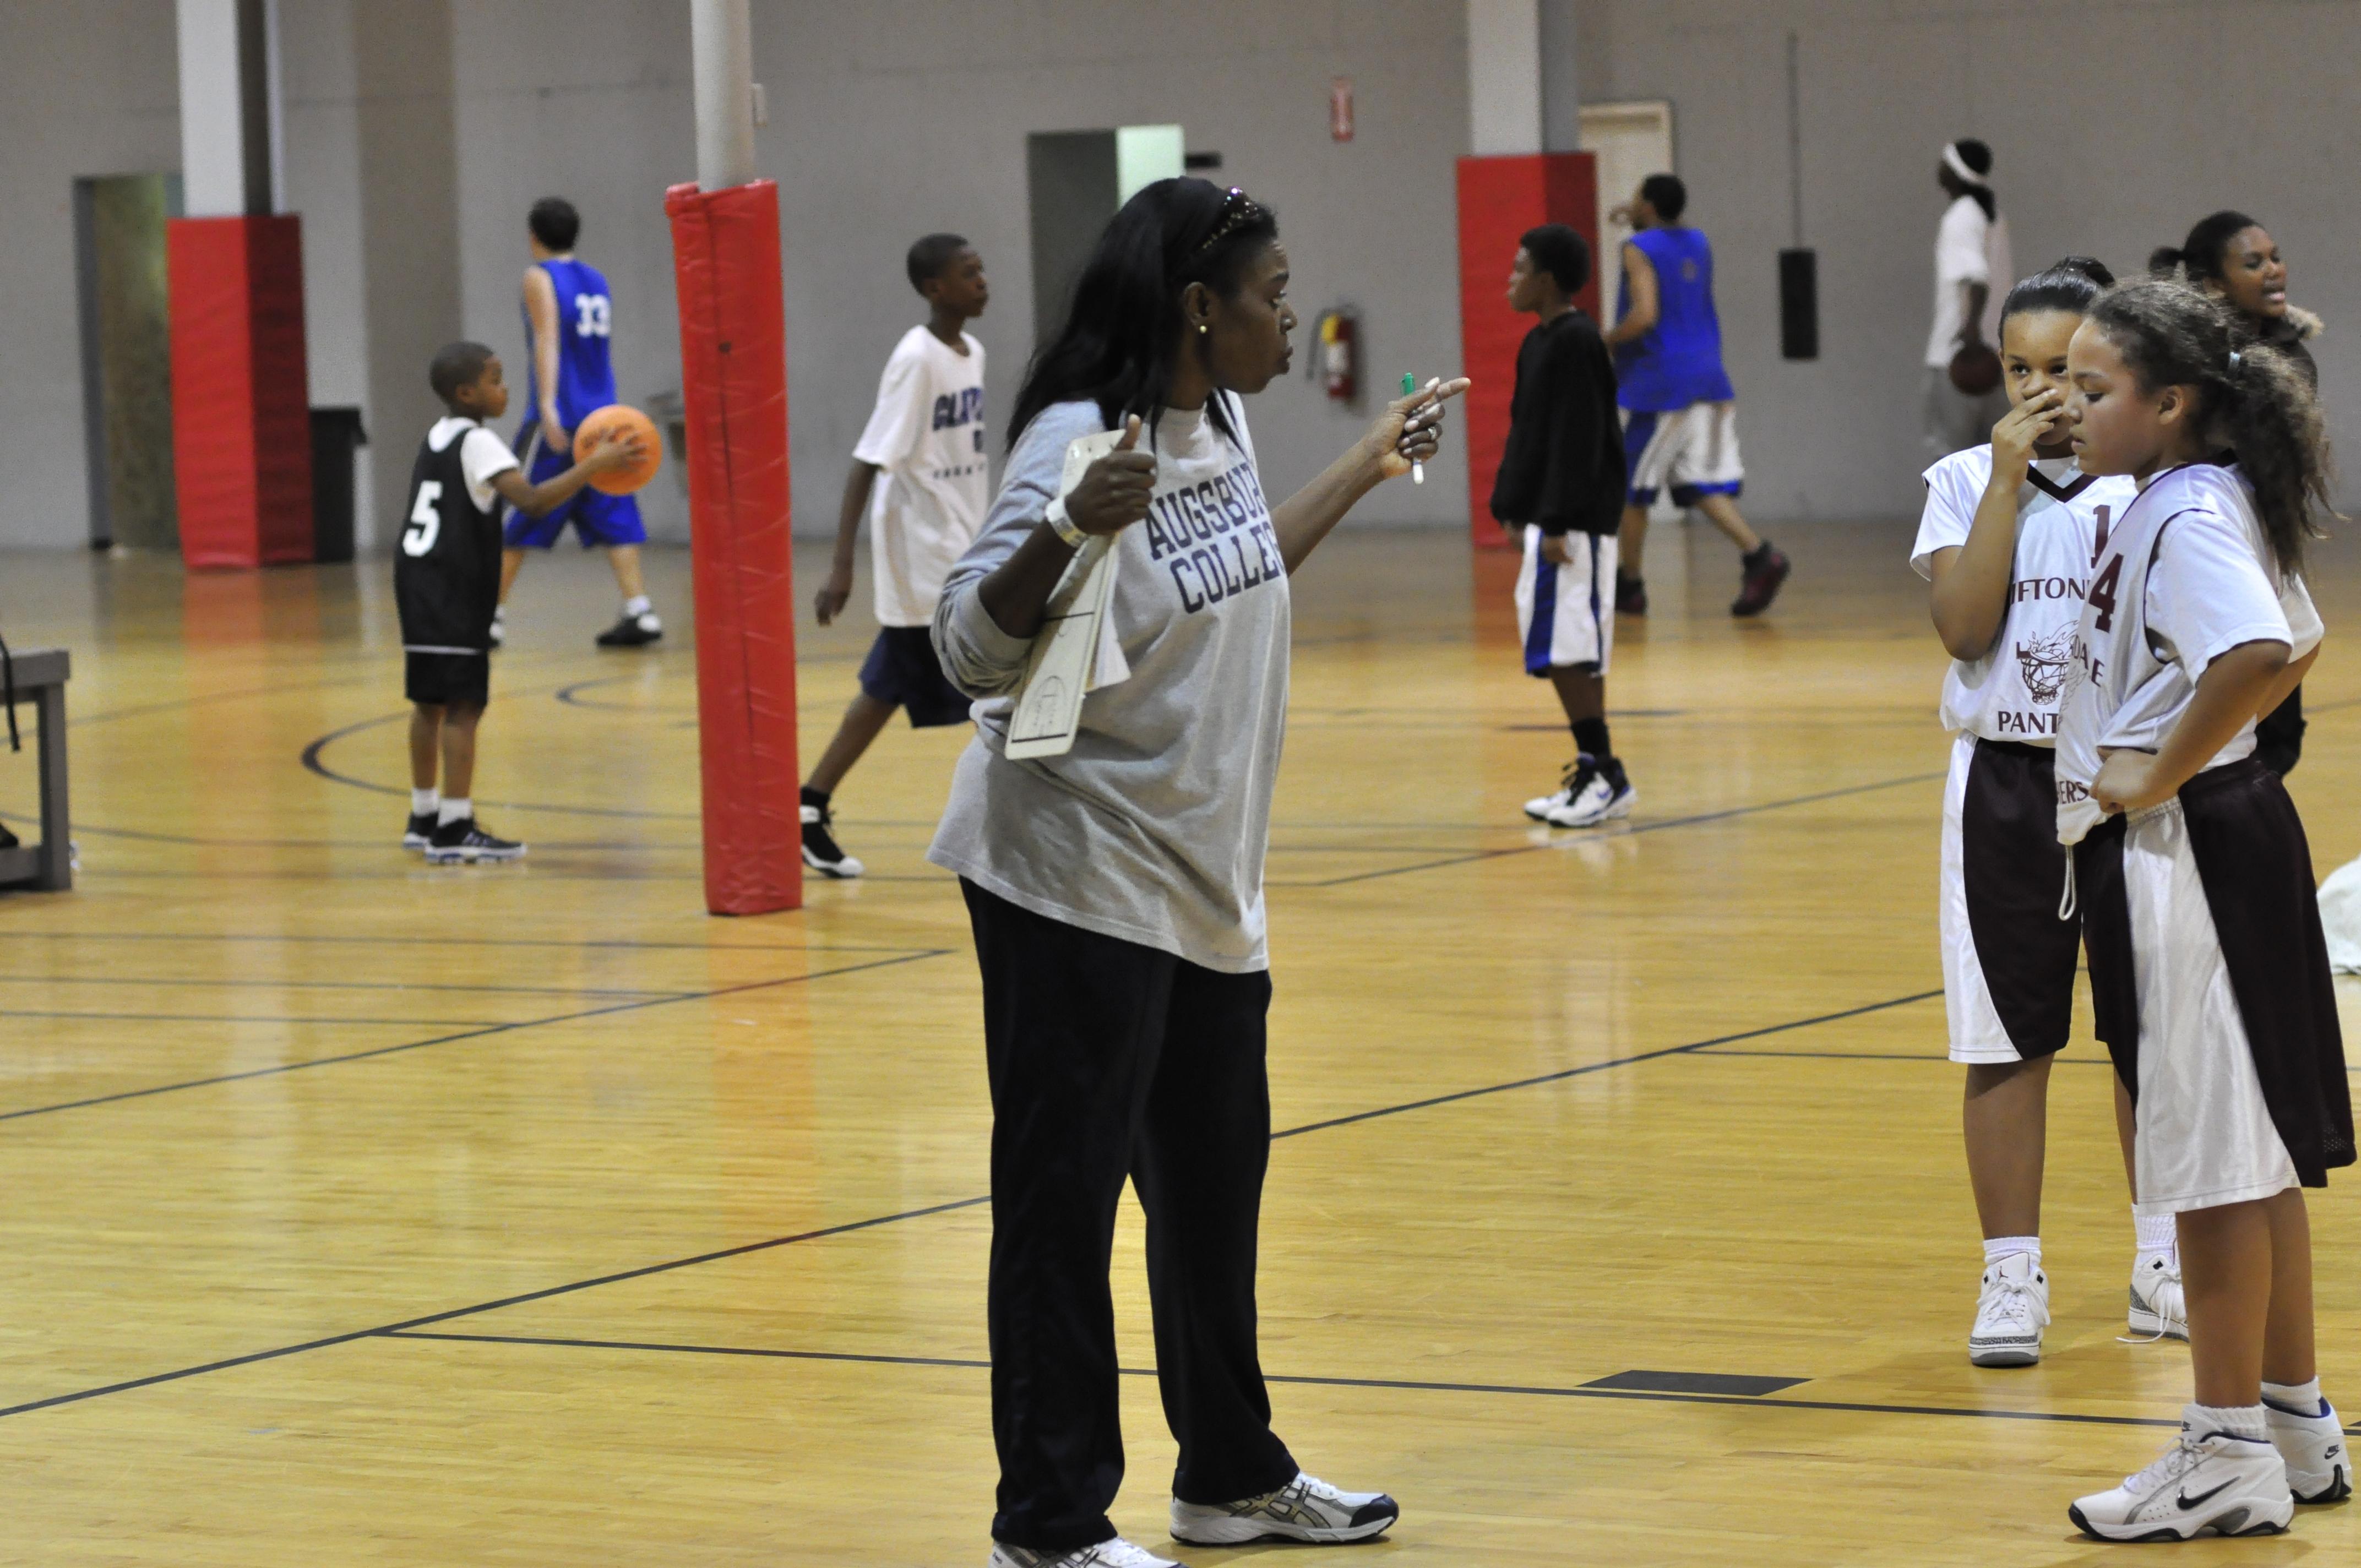 CoachRhonda_2008j